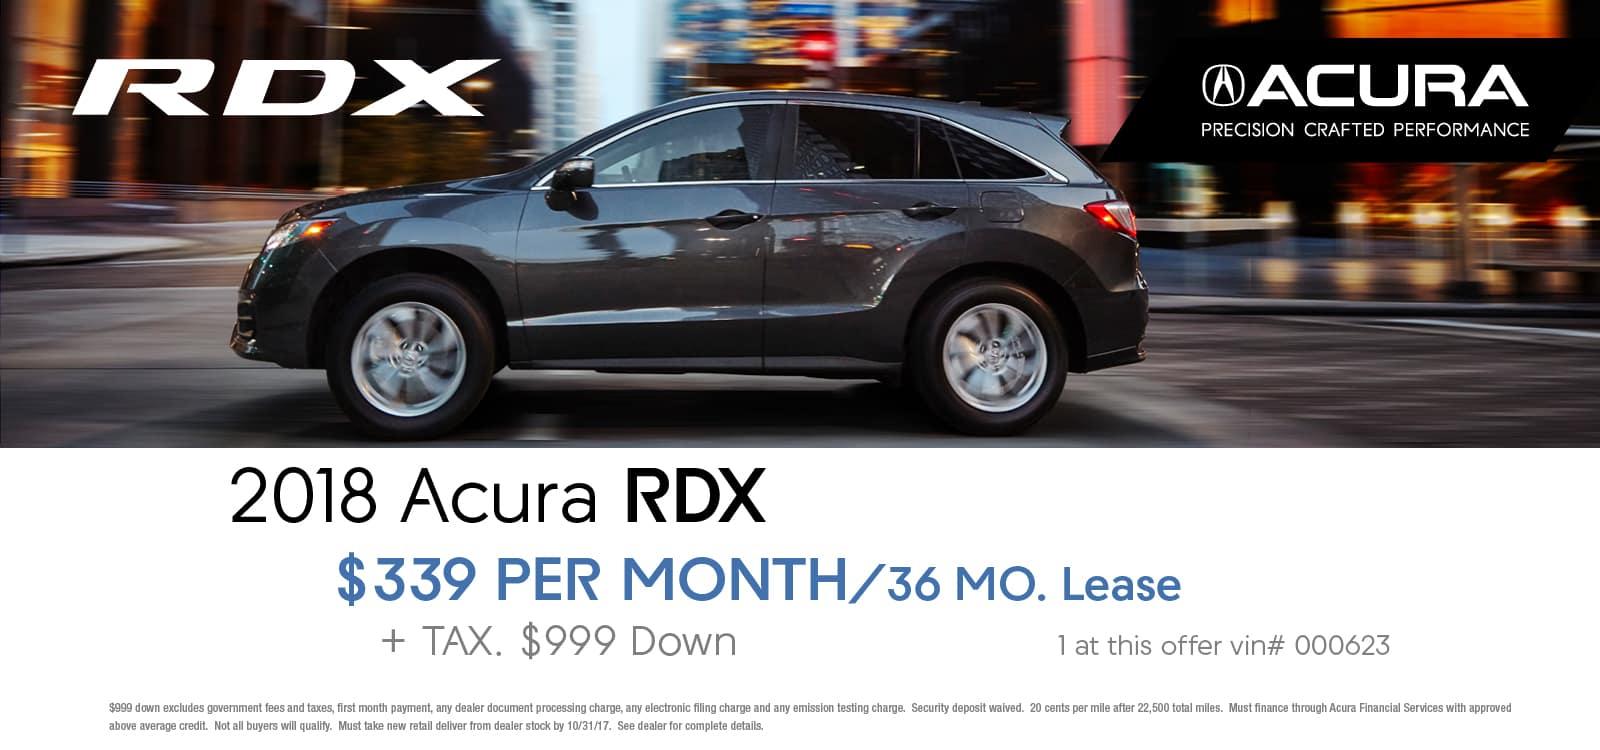 Rdx october lease offer